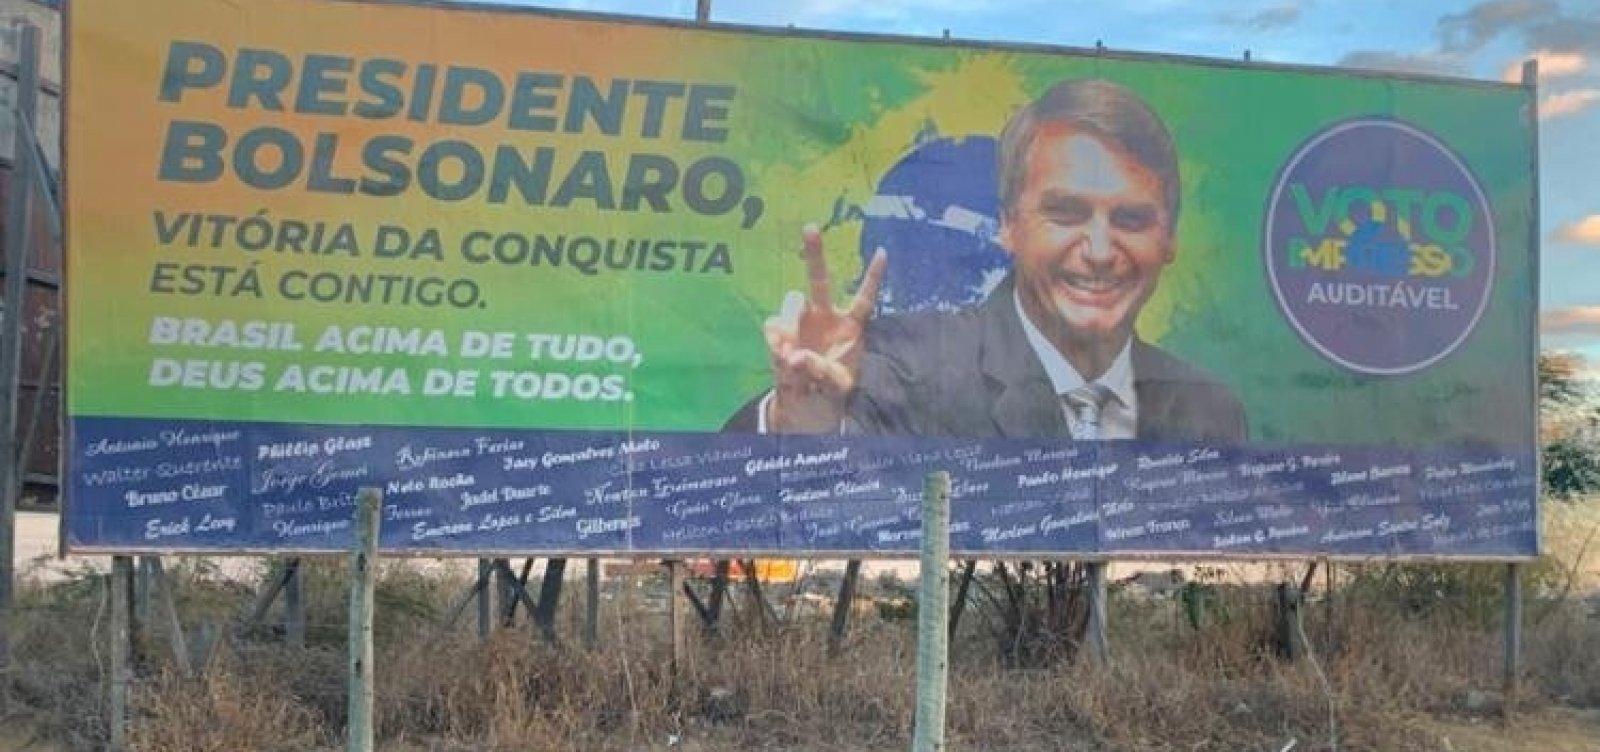 Apoiadores de Bolsonaro intensificam 'batalha' do outdoor no interior da Bahia